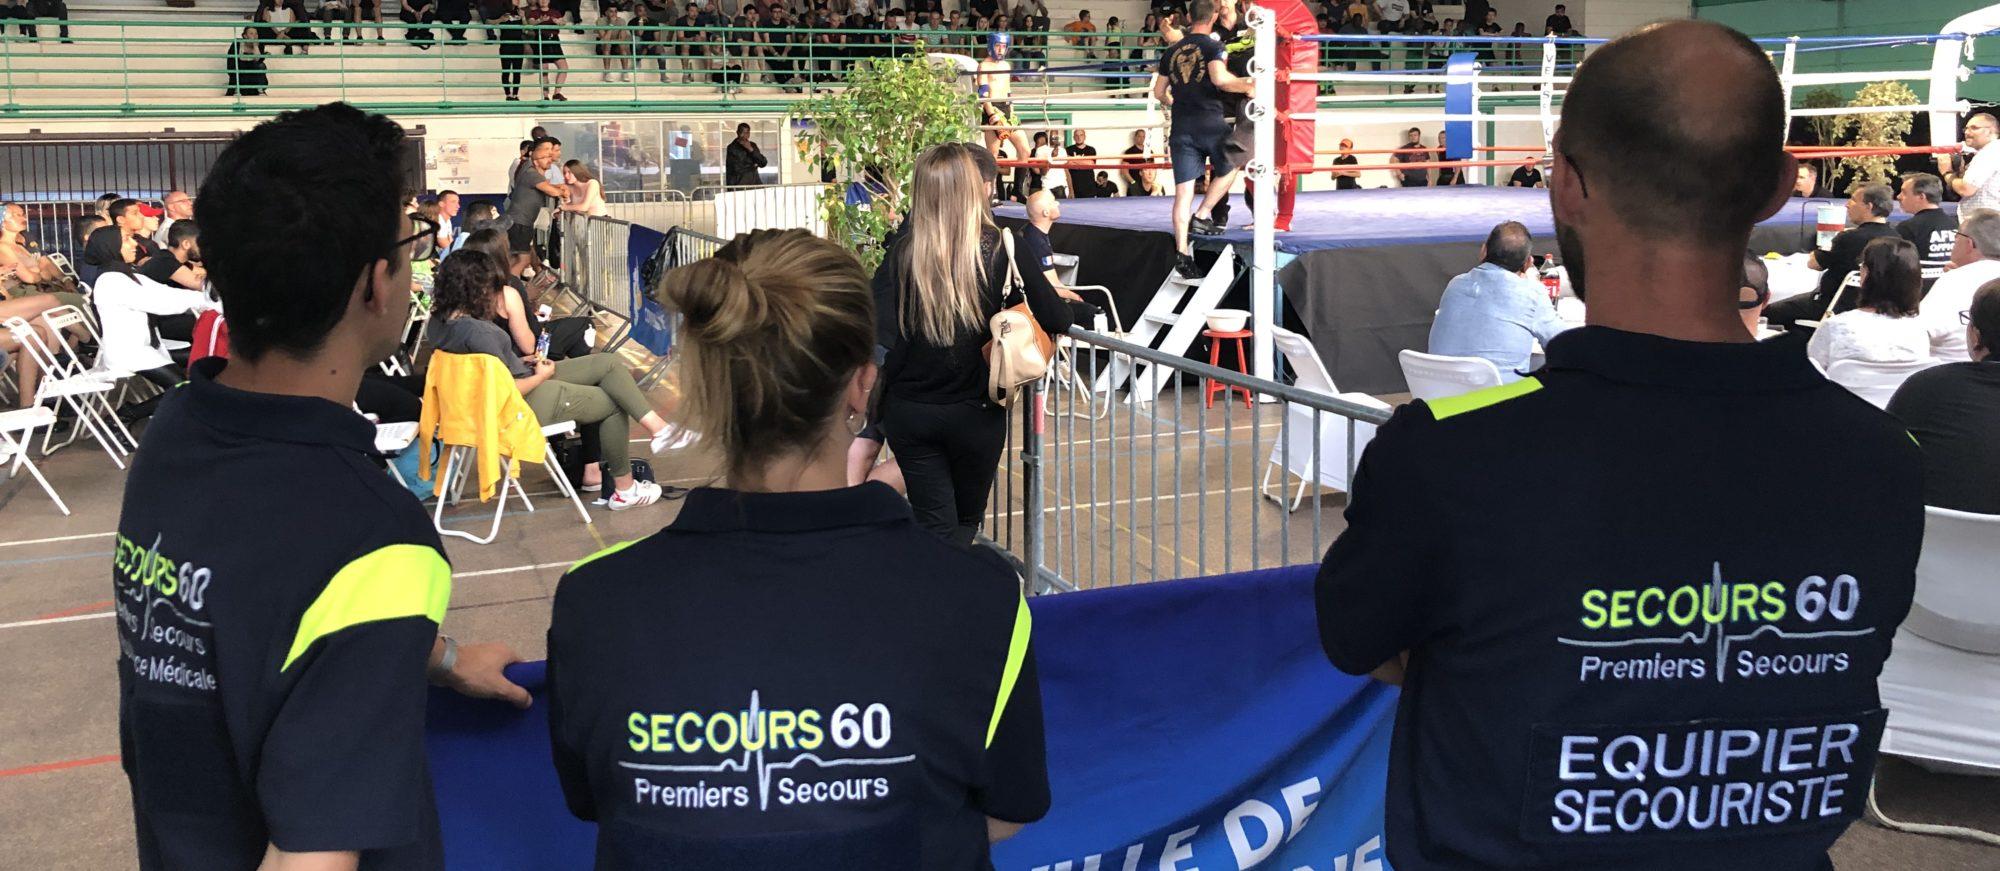 Secours 60